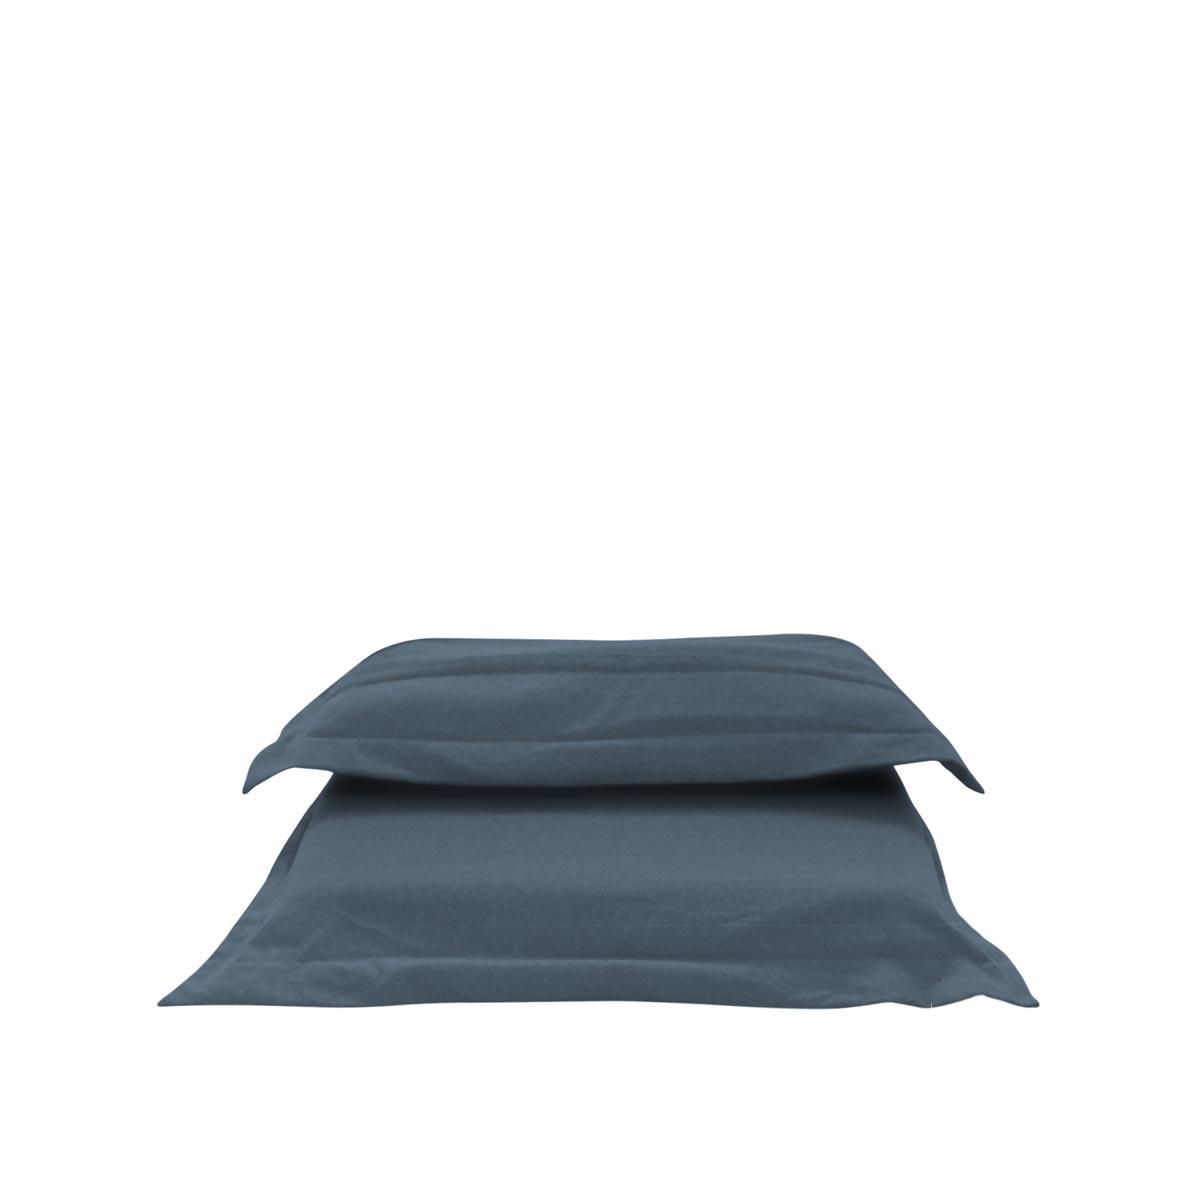 Pufe ClicClac Uno Lounge Tecido Ecolona Jeans Blue 01 04